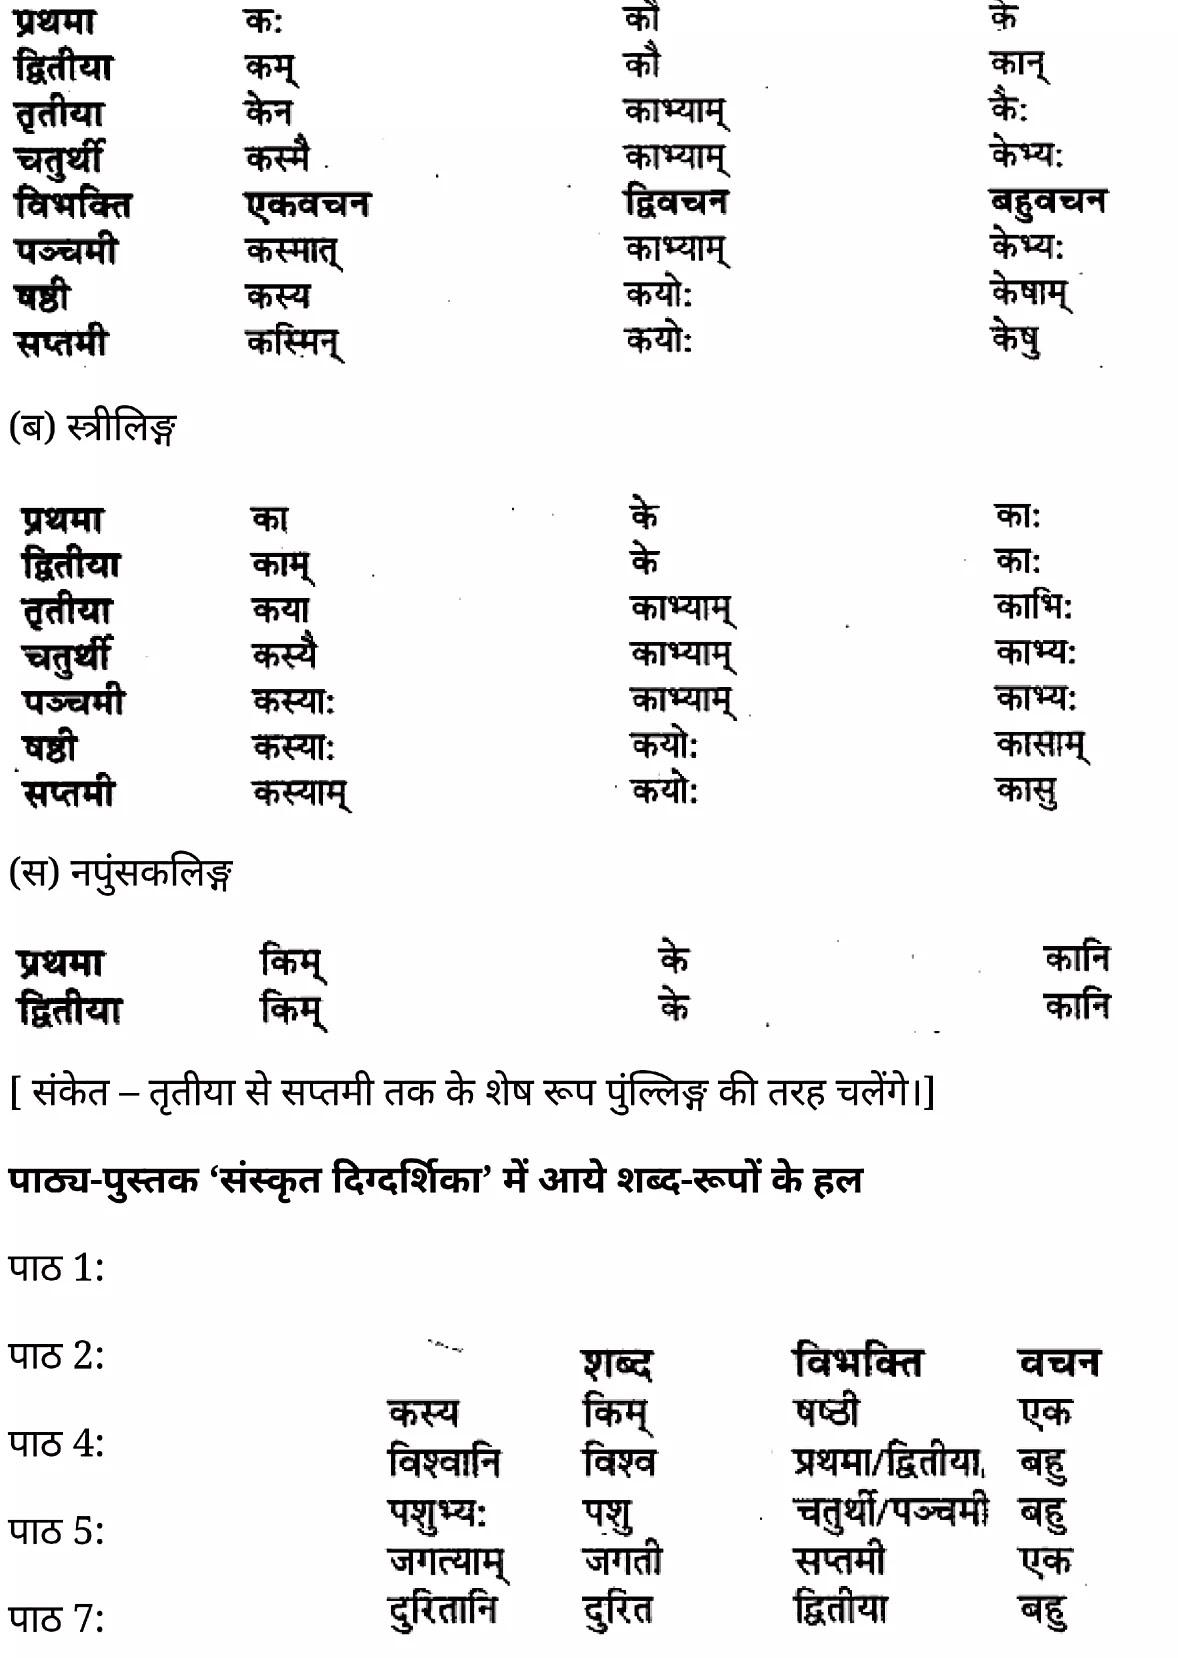 कक्षा 11 साहित्यिक हिंदीशब्द-रूप-प्रकरण  के नोट्स साहित्यिक हिंदी में एनसीईआरटी समाधान,   class 11 sahityik hindi shabd-roop-prakaran,  class 11 sahityik hindi shabd-roop-prakaran ncert solutions in sahityik hindi,  class 11 sahityik hindi shabd-roop-prakaran notes in sahityik hindi,  class 11 sahityik hindi shabd-roop-prakaran question answer,  class 11 sahityik hindi shabd-roop-prakaran notes,  11   class shabd-roop-prakaran in sahityik hindi,  class 11 sahityik hindi shabd-roop-prakaran in sahityik hindi,  class 11 sahityik hindi shabd-roop-prakaran important questions in sahityik hindi,  class 11 sahityik hindi  shabd-roop-prakaran notes in sahityik hindi,  class 11 sahityik hindi shabd-roop-prakaran test,  class 11 sahityik hindi shabd-roop-prakaran pdf,  class 11 sahityik hindi shabd-roop-prakaran notes pdf,  class 11 sahityik hindi shabd-roop-prakaran exercise solutions,  class 11 sahityik hindi shabd-roop-prakaran, class 11 sahityik hindi shabd-roop-prakaran notes study rankers,  class 11 sahityik hindi shabd-roop-prakaran notes,  class 11 sahityik hindi  shabd-roop-prakaran notes,   shabd-roop-prakaran 11  notes pdf, shabd-roop-prakaran class 11  notes  ncert,  shabd-roop-prakaran class 11 pdf,   shabd-roop-prakaran  book,    shabd-roop-prakaran quiz class 11  ,       11  th shabd-roop-prakaran    book up board,       up board 11  th shabd-roop-prakaran notes,  कक्षा 11 साहित्यिक हिंदीशब्द-रूप-प्रकरण , कक्षा 11 साहित्यिक हिंदी का शब्द-रूप-प्रकरण , कक्षा 11 साहित्यिक हिंदी के शब्द-रूप-प्रकरण  के नोट्स हिंदी में, कक्षा 11 का साहित्यिक हिंदीशब्द-रूप-प्रकरण का प्रश्न उत्तर, कक्षा 11 साहित्यिक हिंदीशब्द-रूप-प्रकरण के नोट्स, 11 कक्षा साहित्यिक हिंदीशब्द-रूप-प्रकरण   साहित्यिक हिंदी में, कक्षा 11 साहित्यिक हिंदीशब्द-रूप-प्रकरण हिंदी में, कक्षा 11 साहित्यिक हिंदीशब्द-रूप-प्रकरण  महत्वपूर्ण प्रश्न हिंदी में, कक्षा 11 के साहित्यिक हिंदी के नोट्स हिंदी में,साहित्यिक हिंदी कक्षा 11 नोट्स pdf,  साहित्यिक हिंदी  कक्षा 11 नोट्स 2021 ncert,  साहित्यिक हिंदी  कक्षा 11 pdf, 